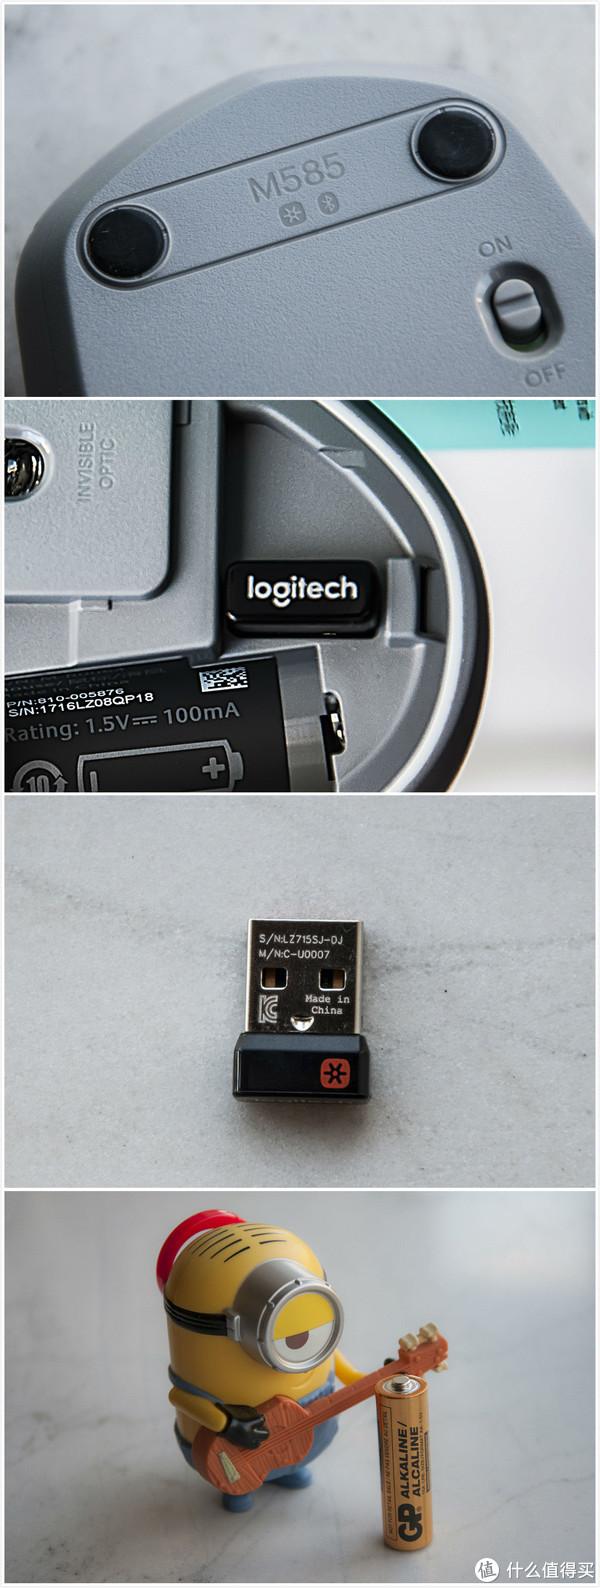 Logitech 罗技 585 鼠标开箱与FLOW功能解析